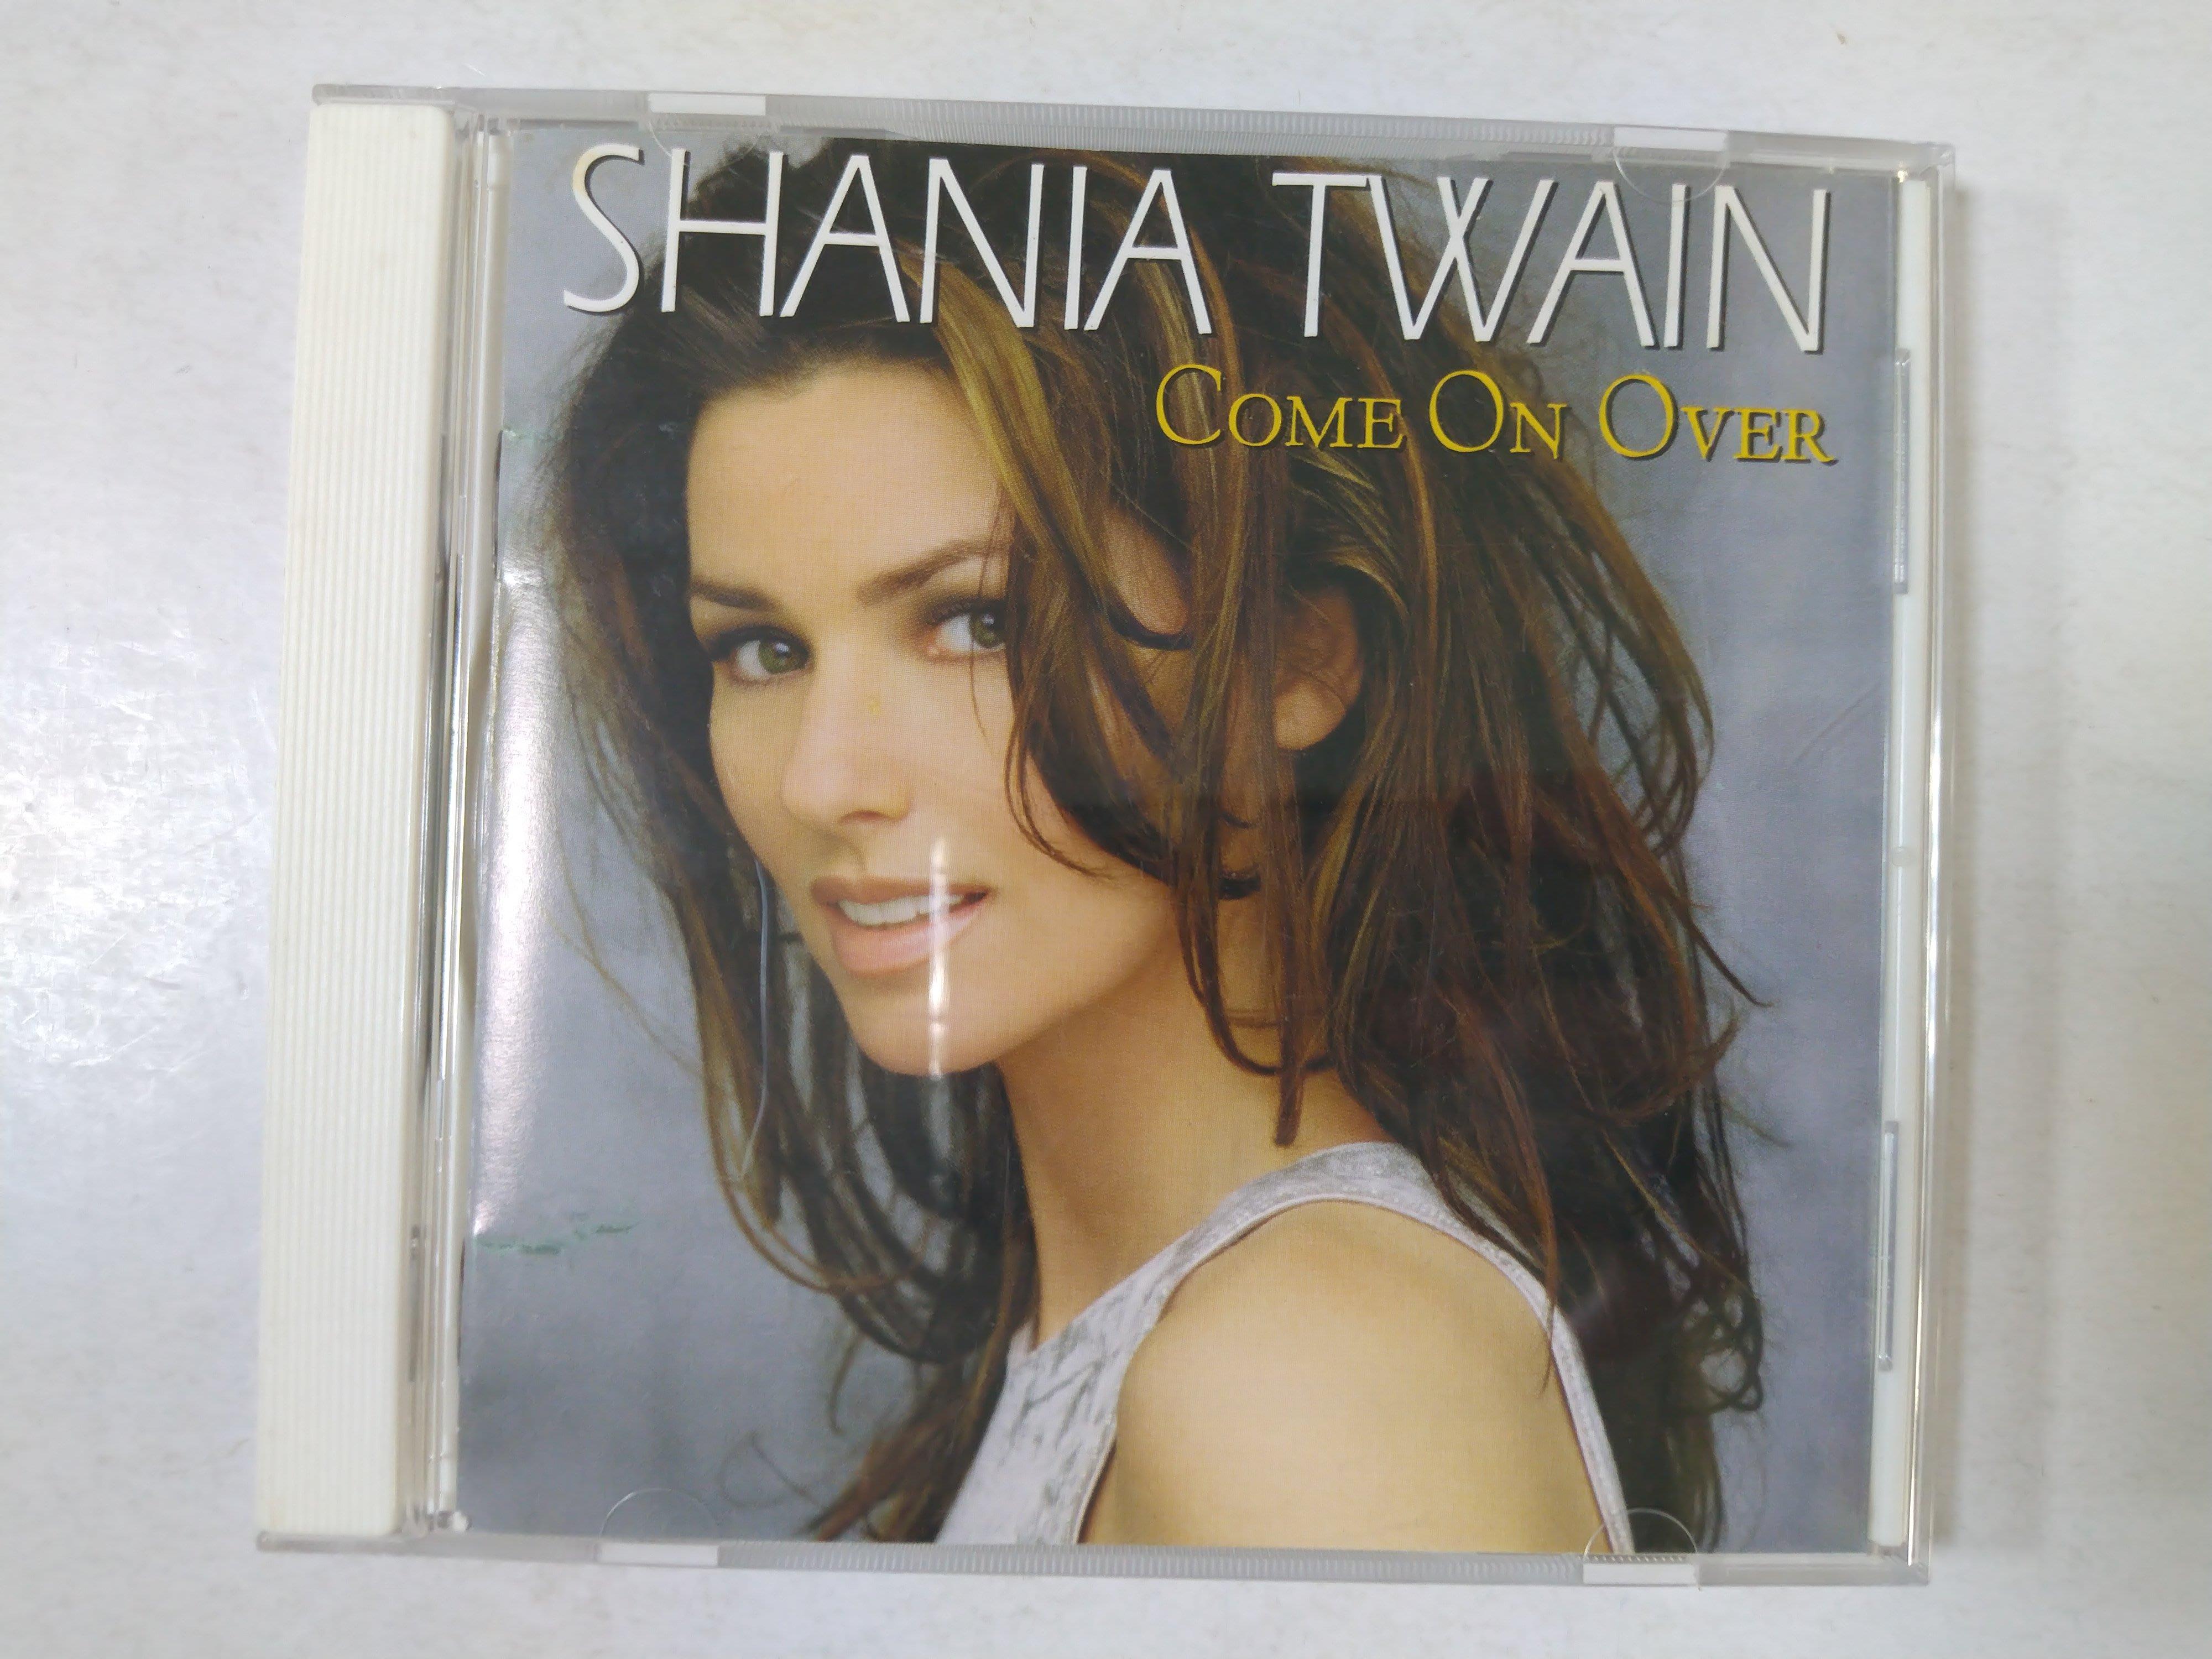 昀嫣音樂(CD42)  SHANIA TWAIN COME ON OVER 澳大利亞壓片 片況如圖 售出不退 可正常播放